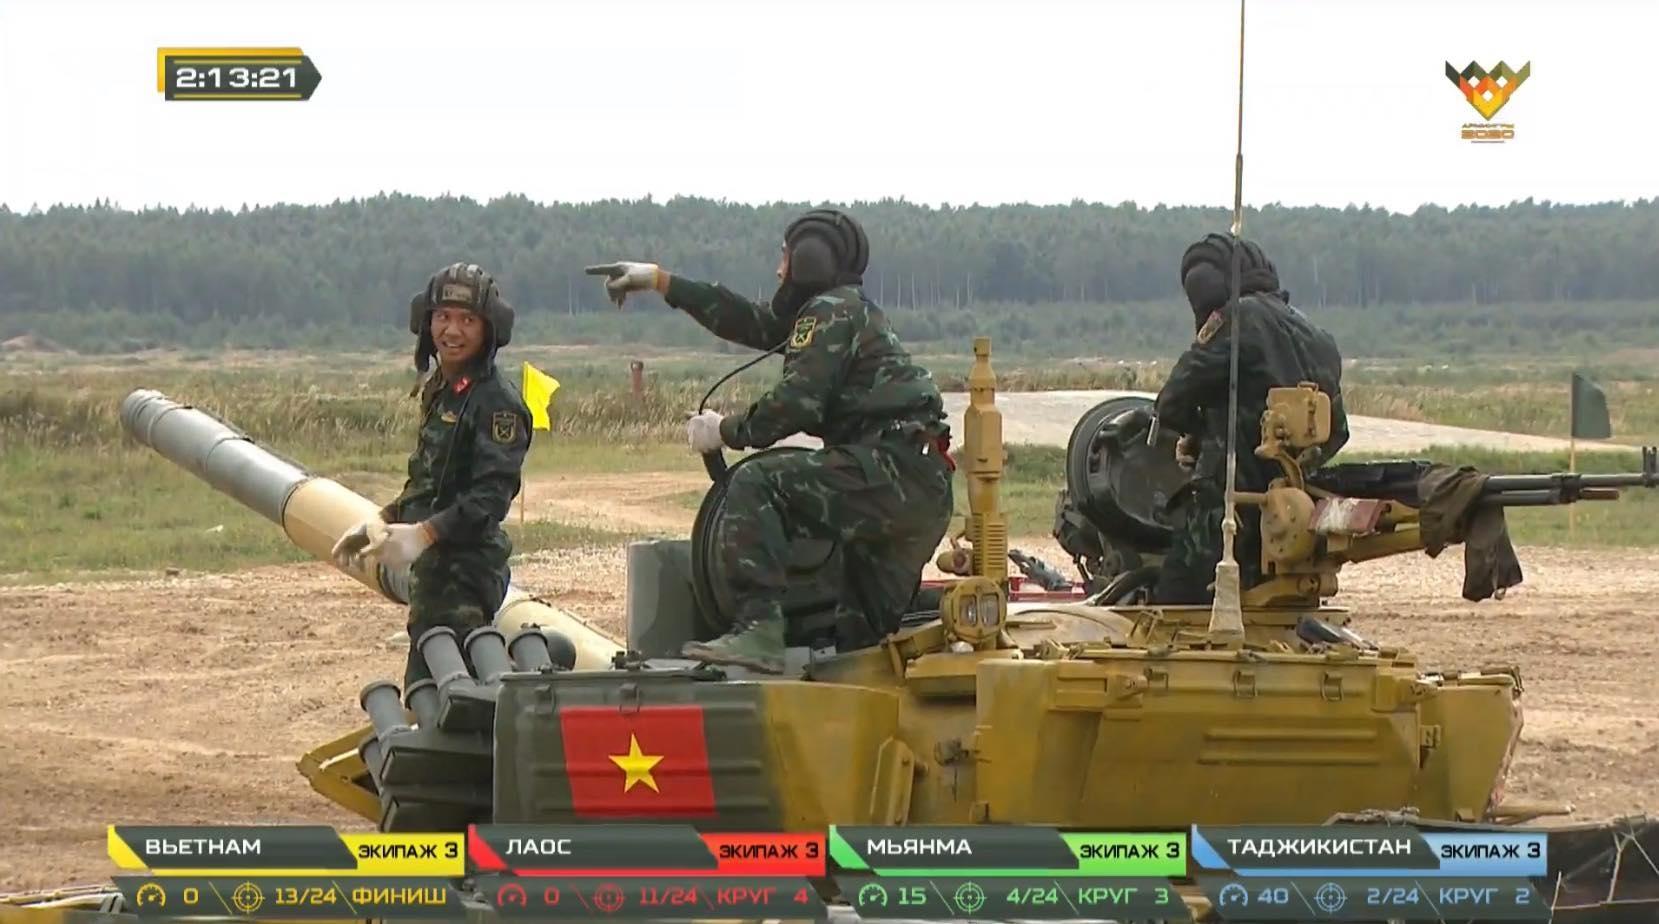 army games 2020 vietnam team ranks first in tank biathlons group 2